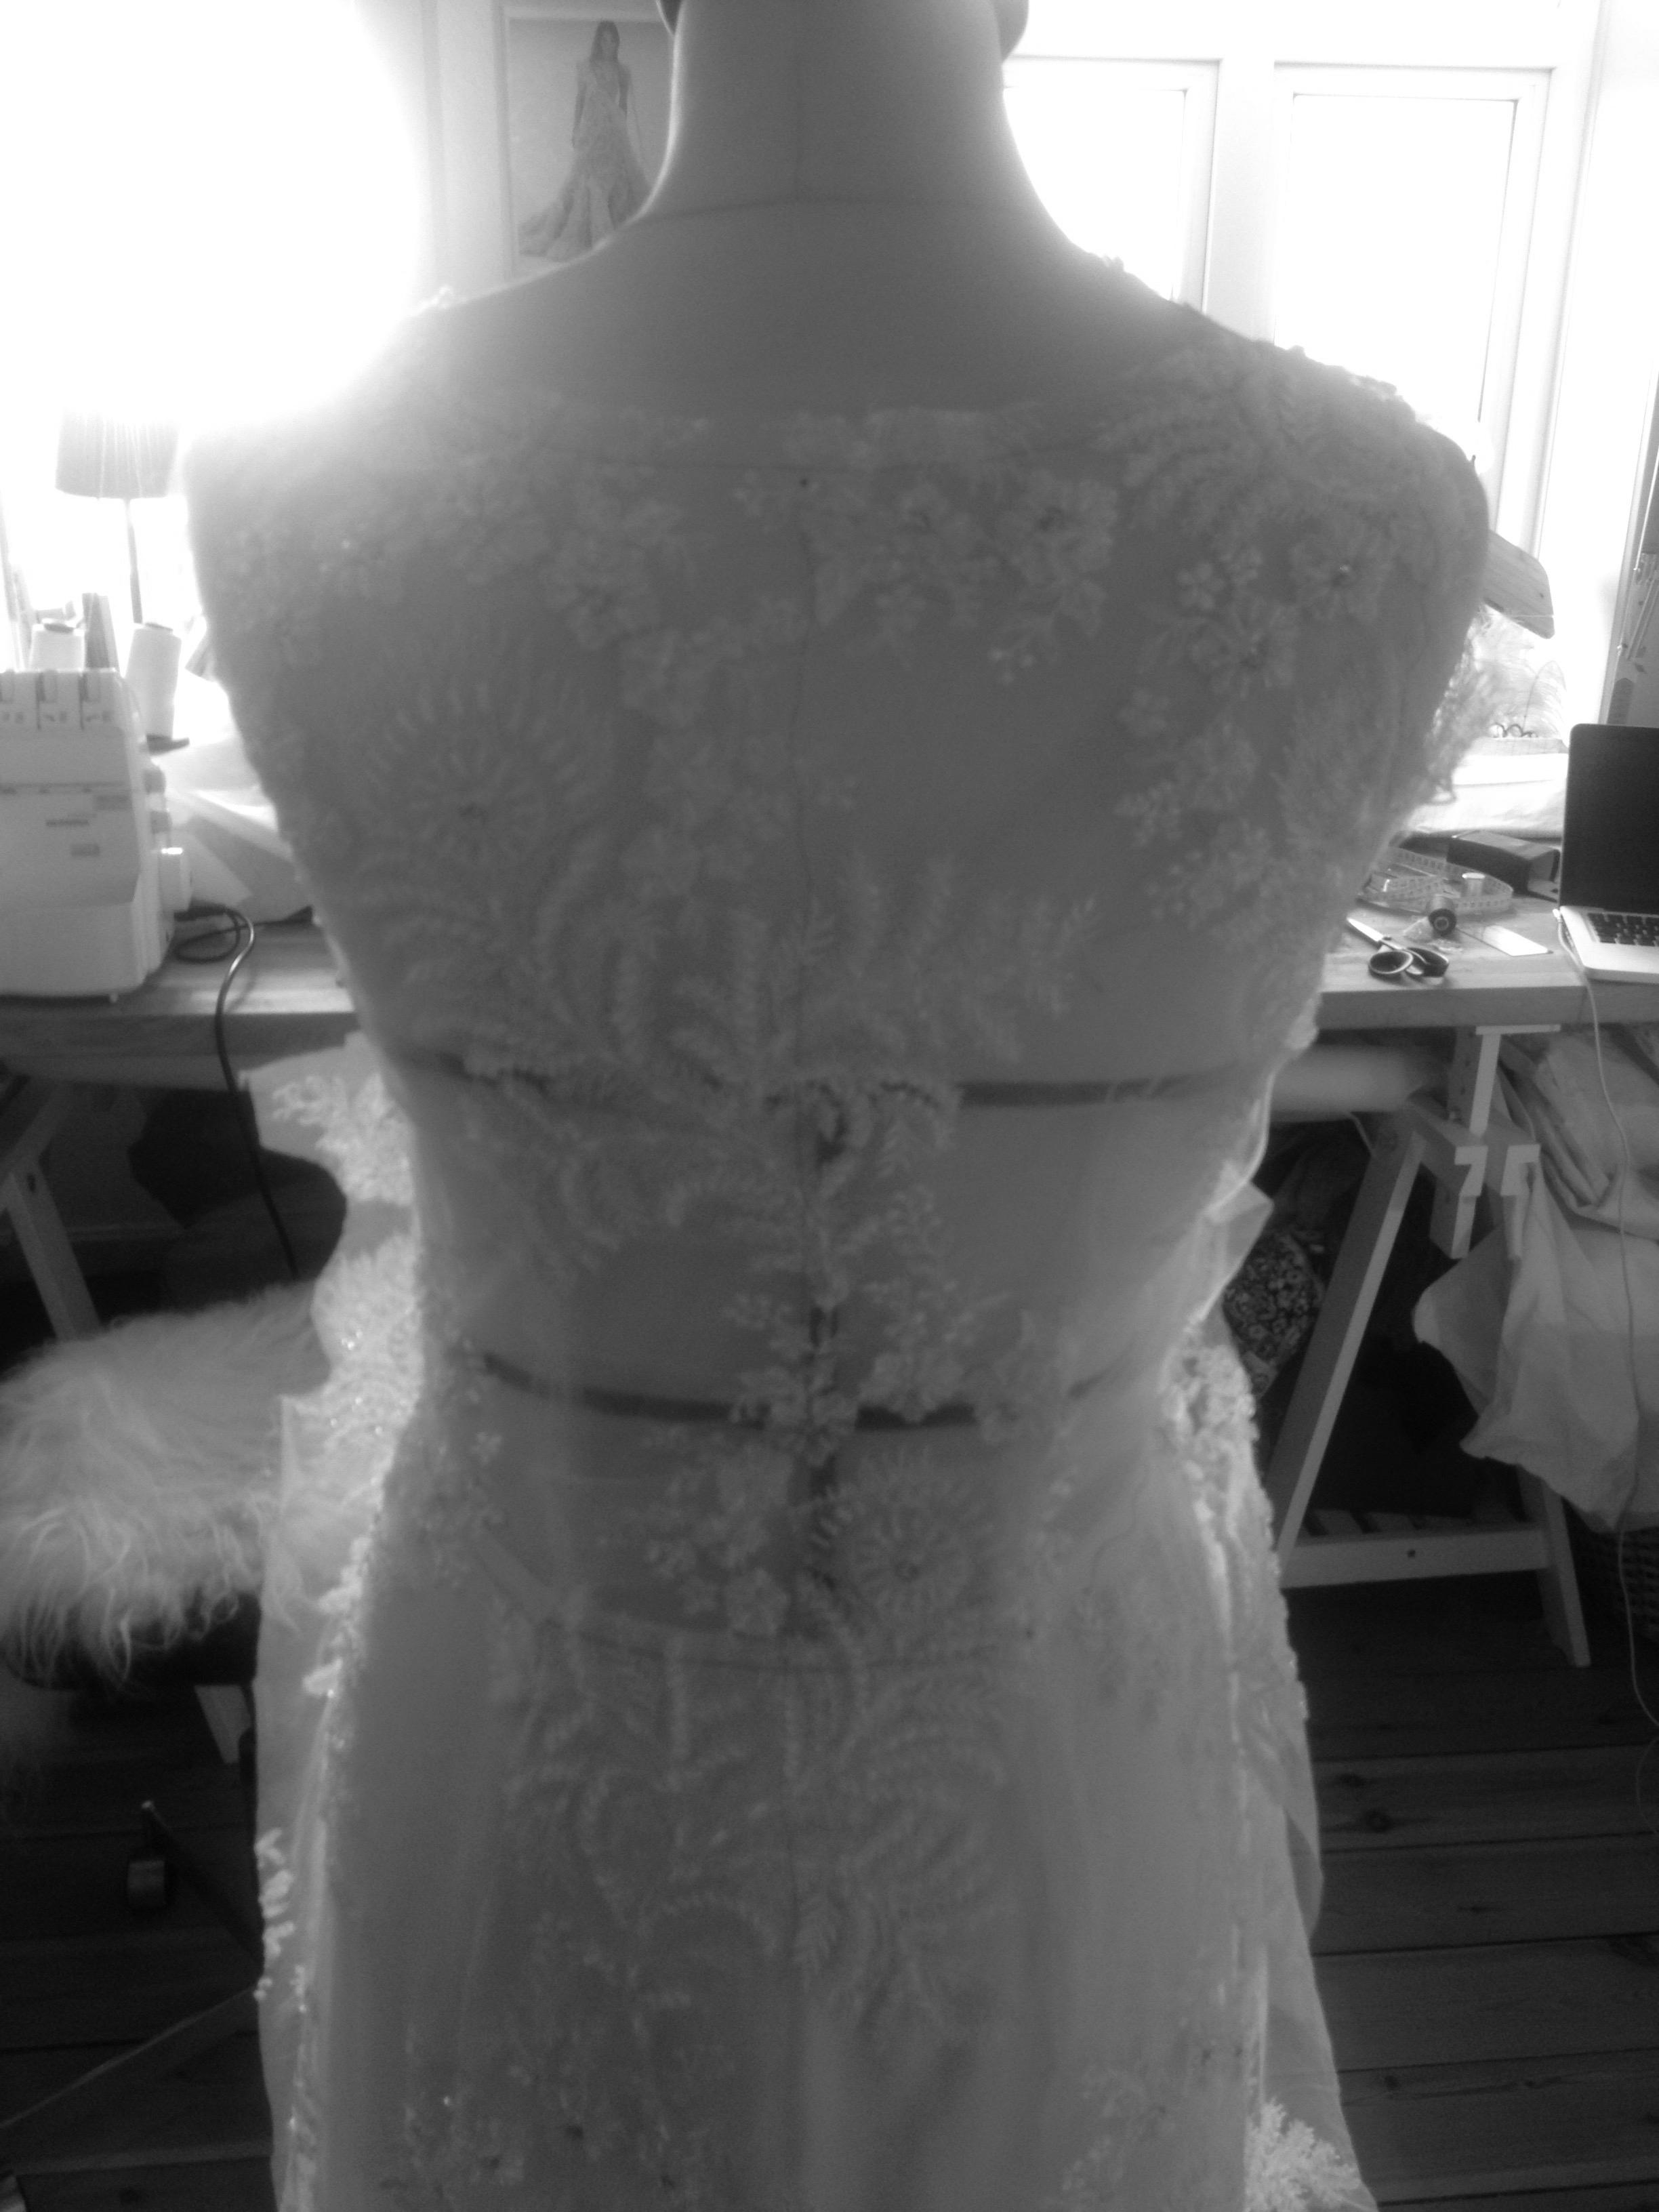 Blondekjole brudekjole